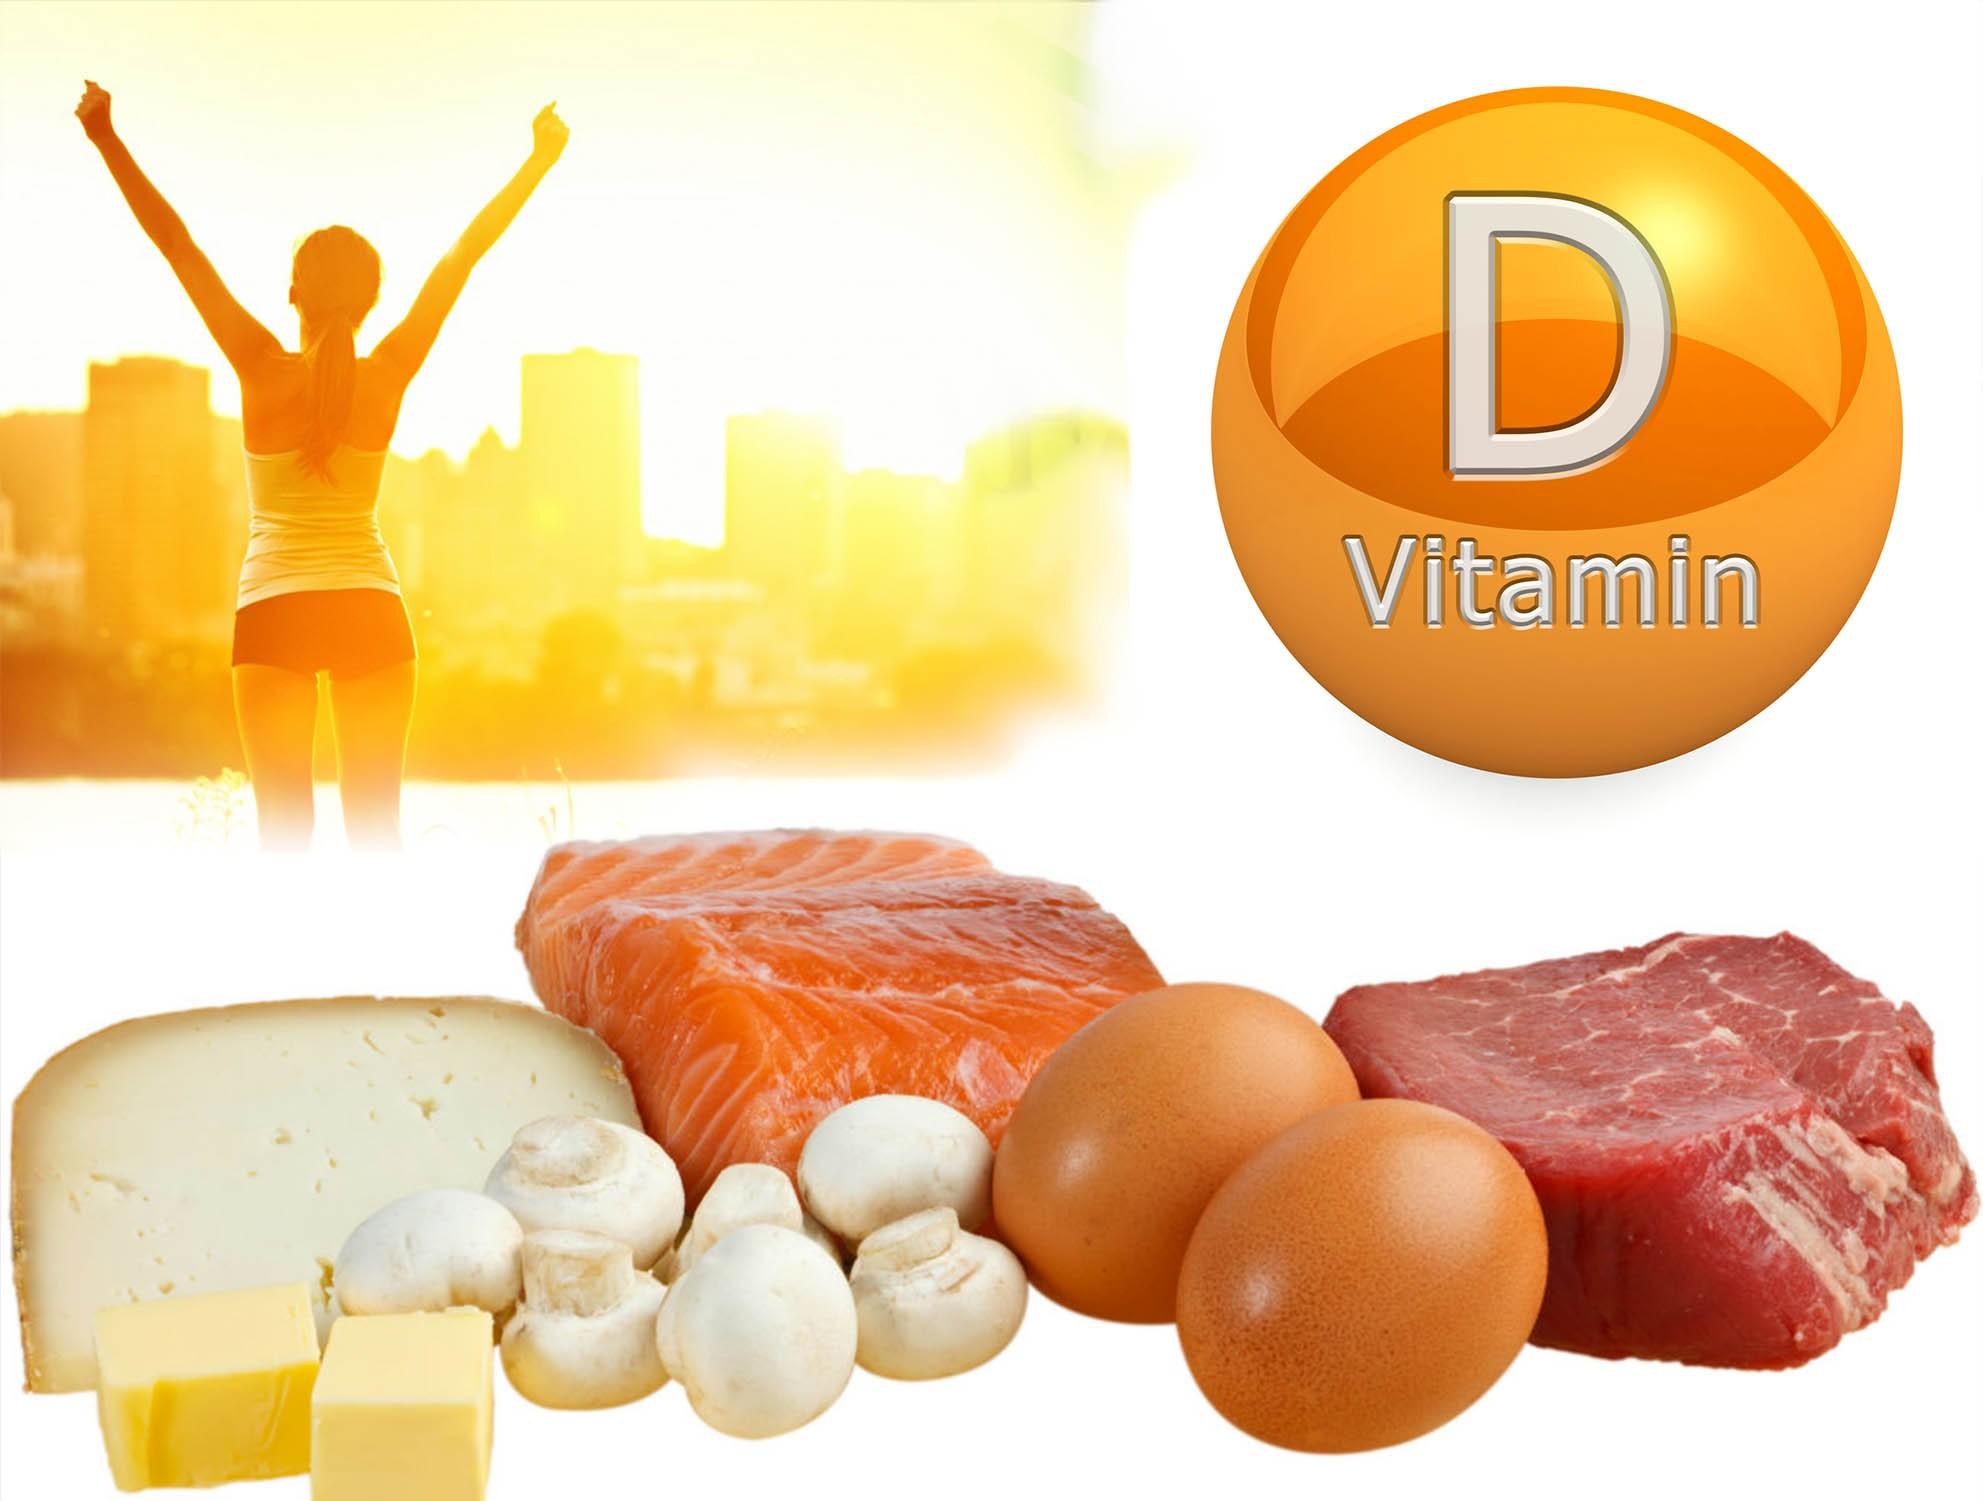 صور فوائد فيتامين د , فيتامين د و اهم فوائده و اعراض نقصه